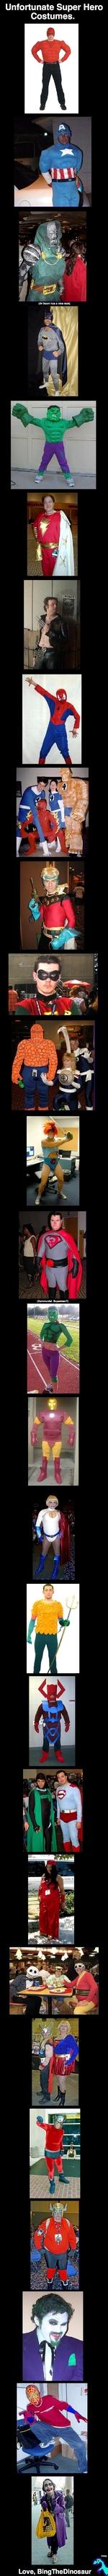 Unfortunate Super Hero Costumes